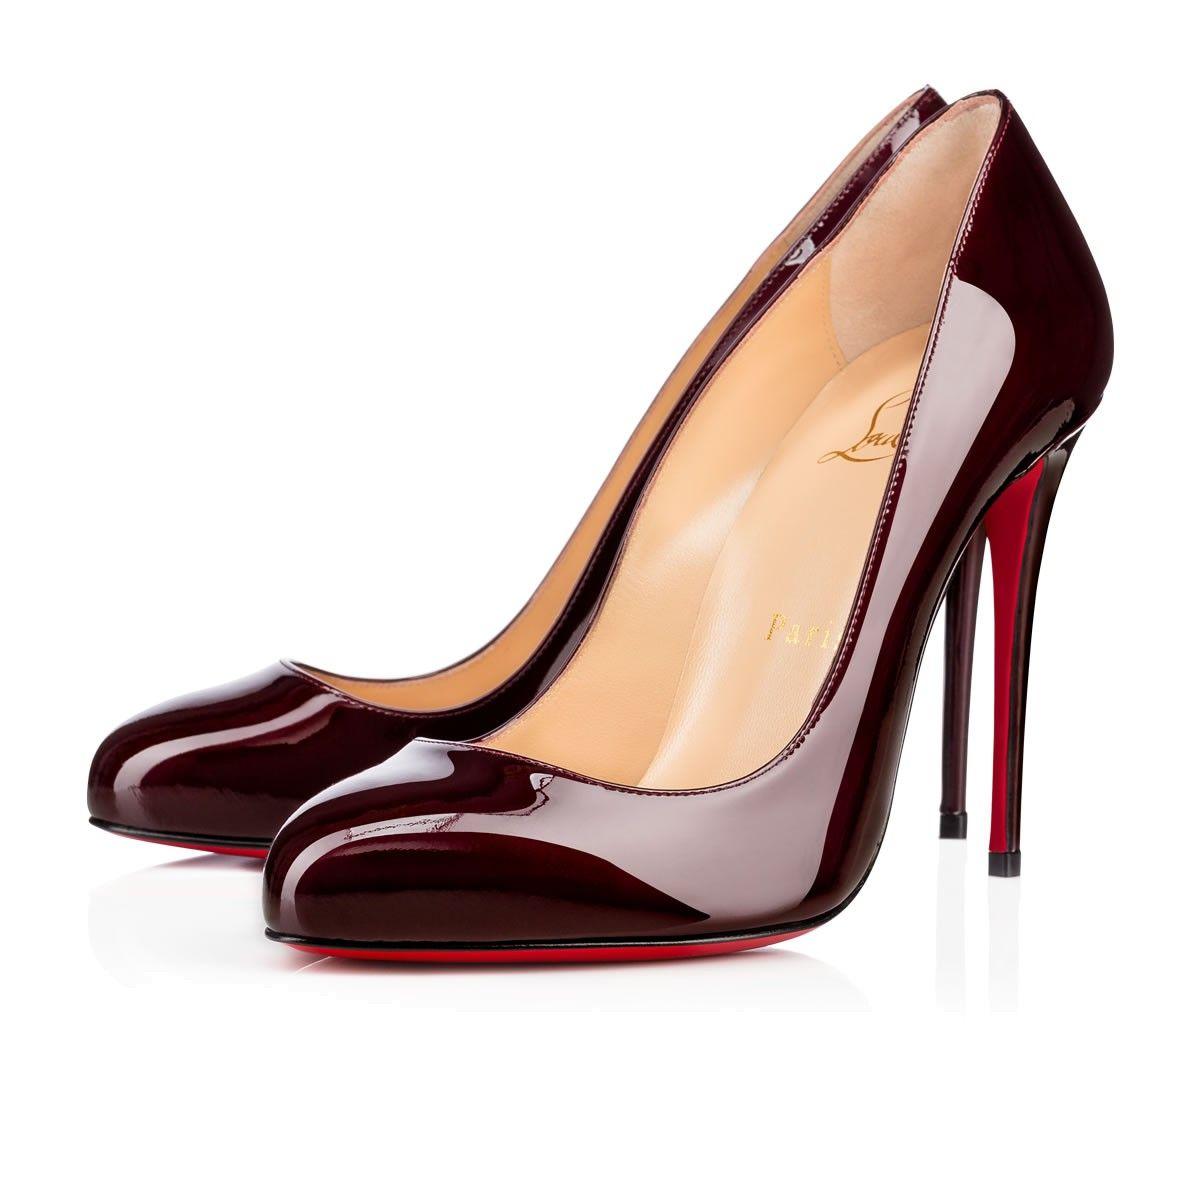 CHRISTIAN LOUBOUTIN Dorissima Metal Patent 100 Orthodoxe Patent Calfskin -  Women Shoes - Christian Louboutin.